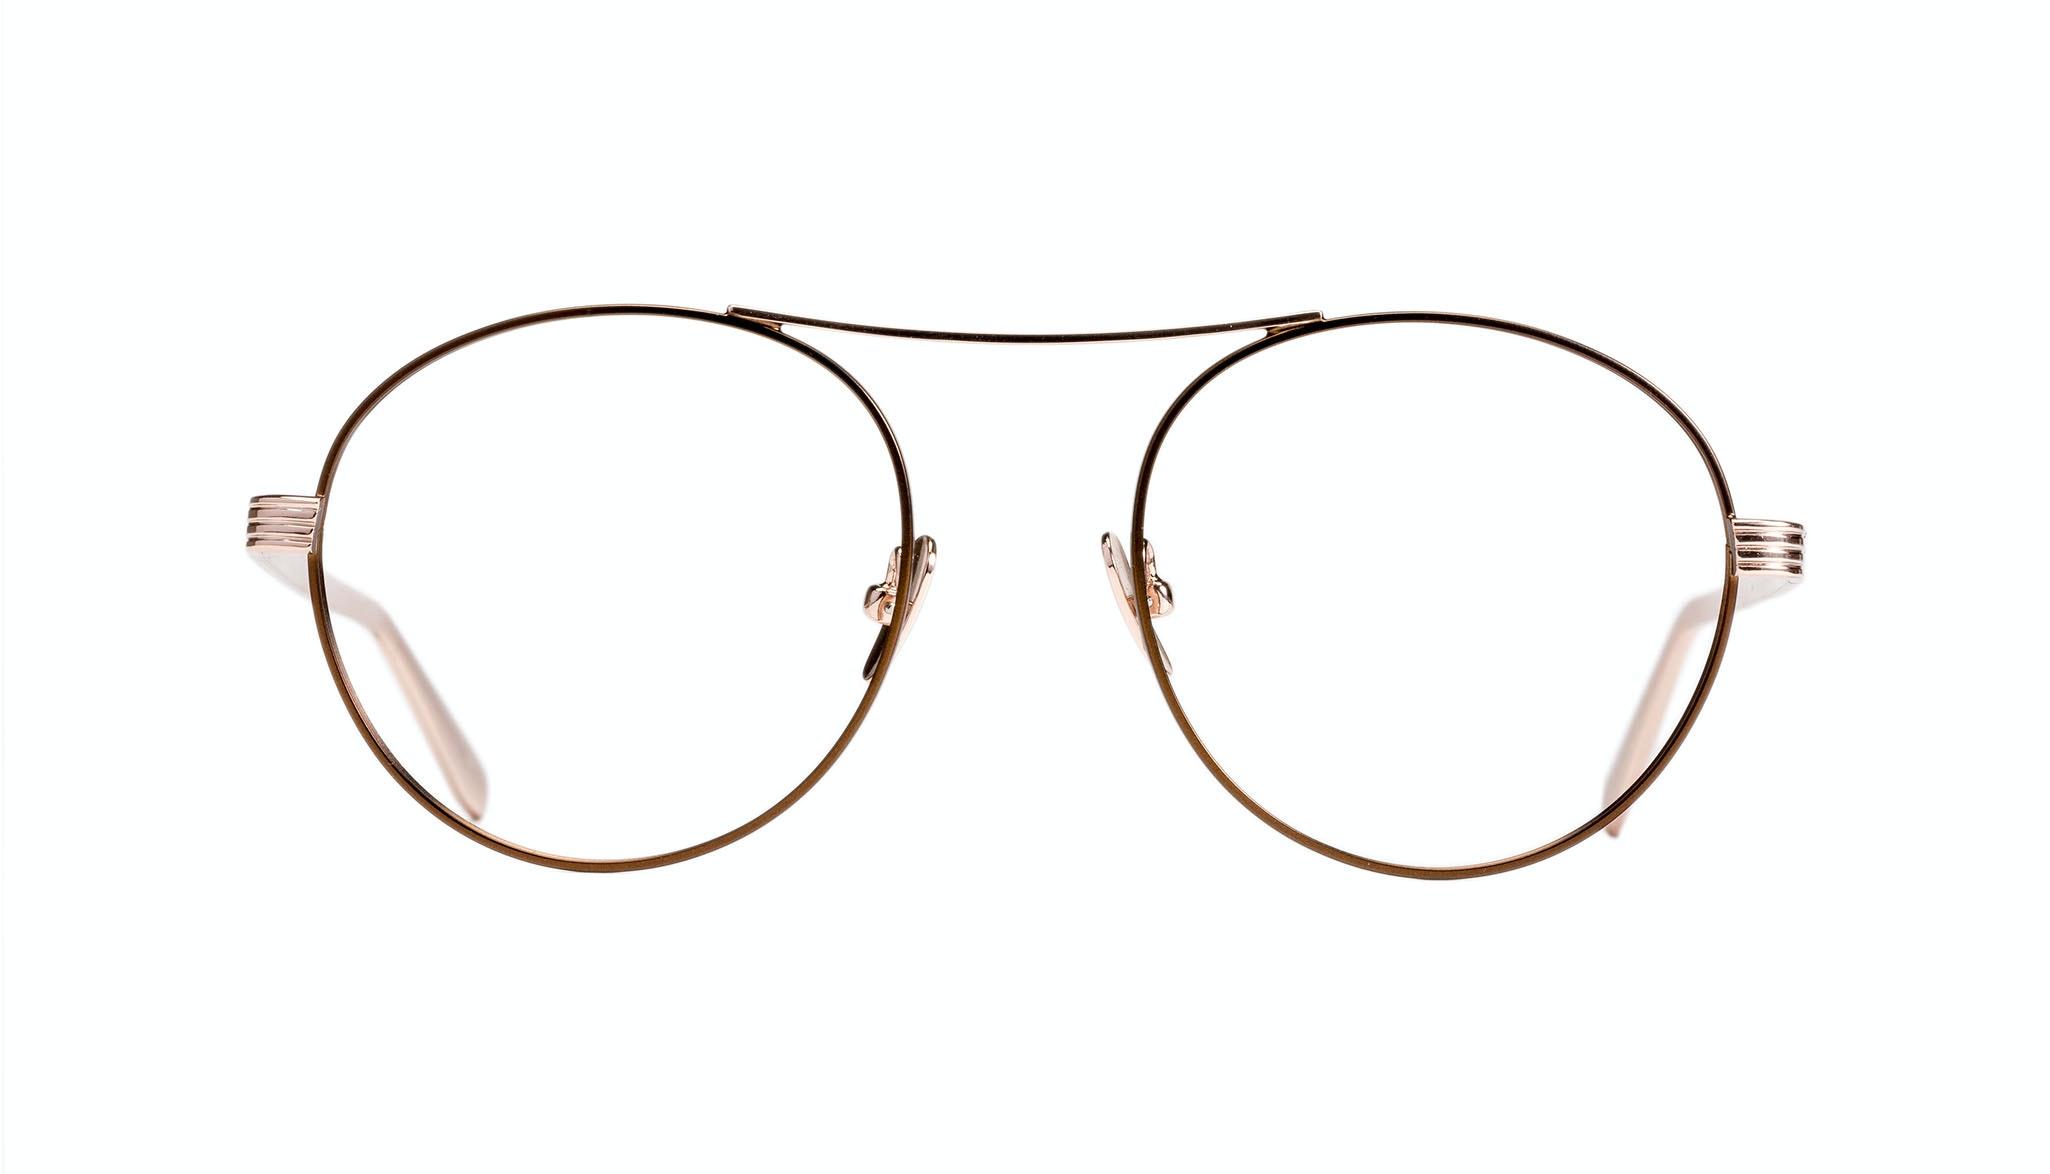 Affordable Fashion Glasses Round Eyeglasses Women Prize Golden Lilac